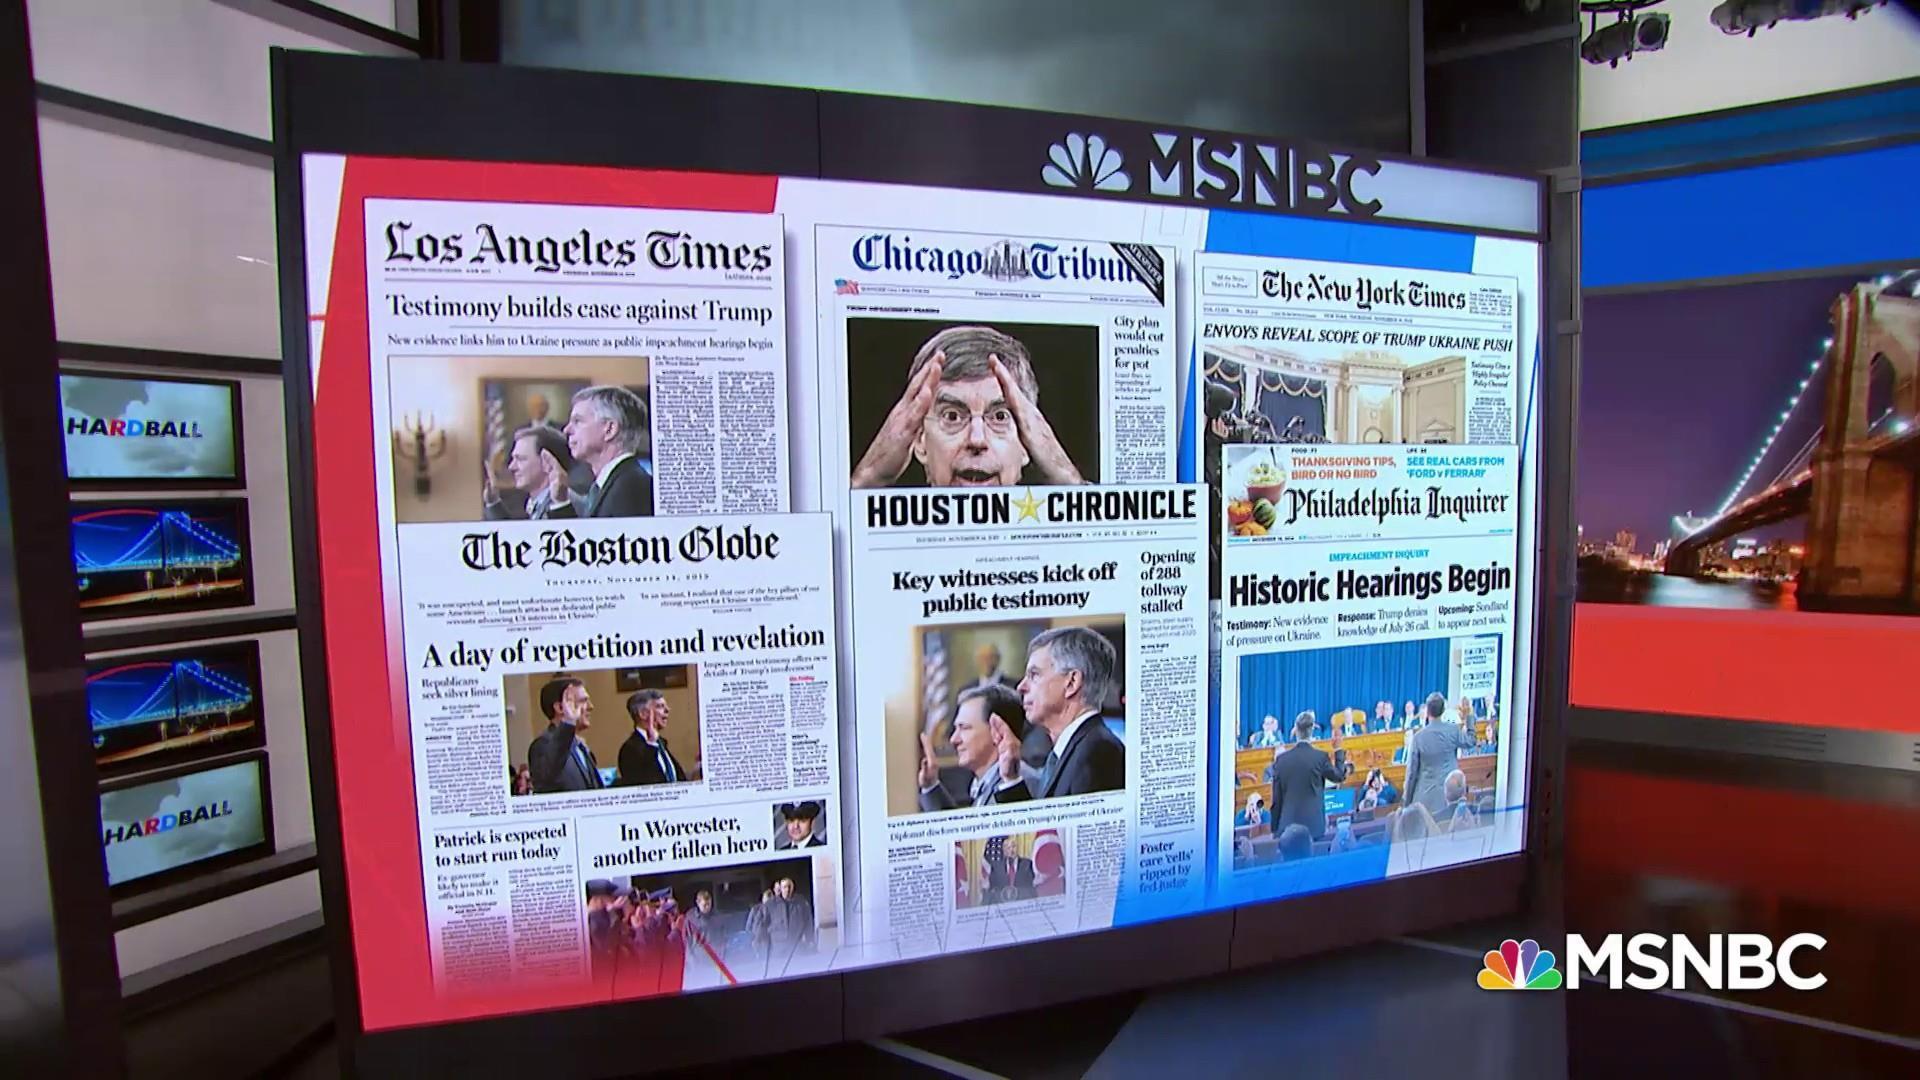 Chris Matthews: Headlines across the country show case against Trump